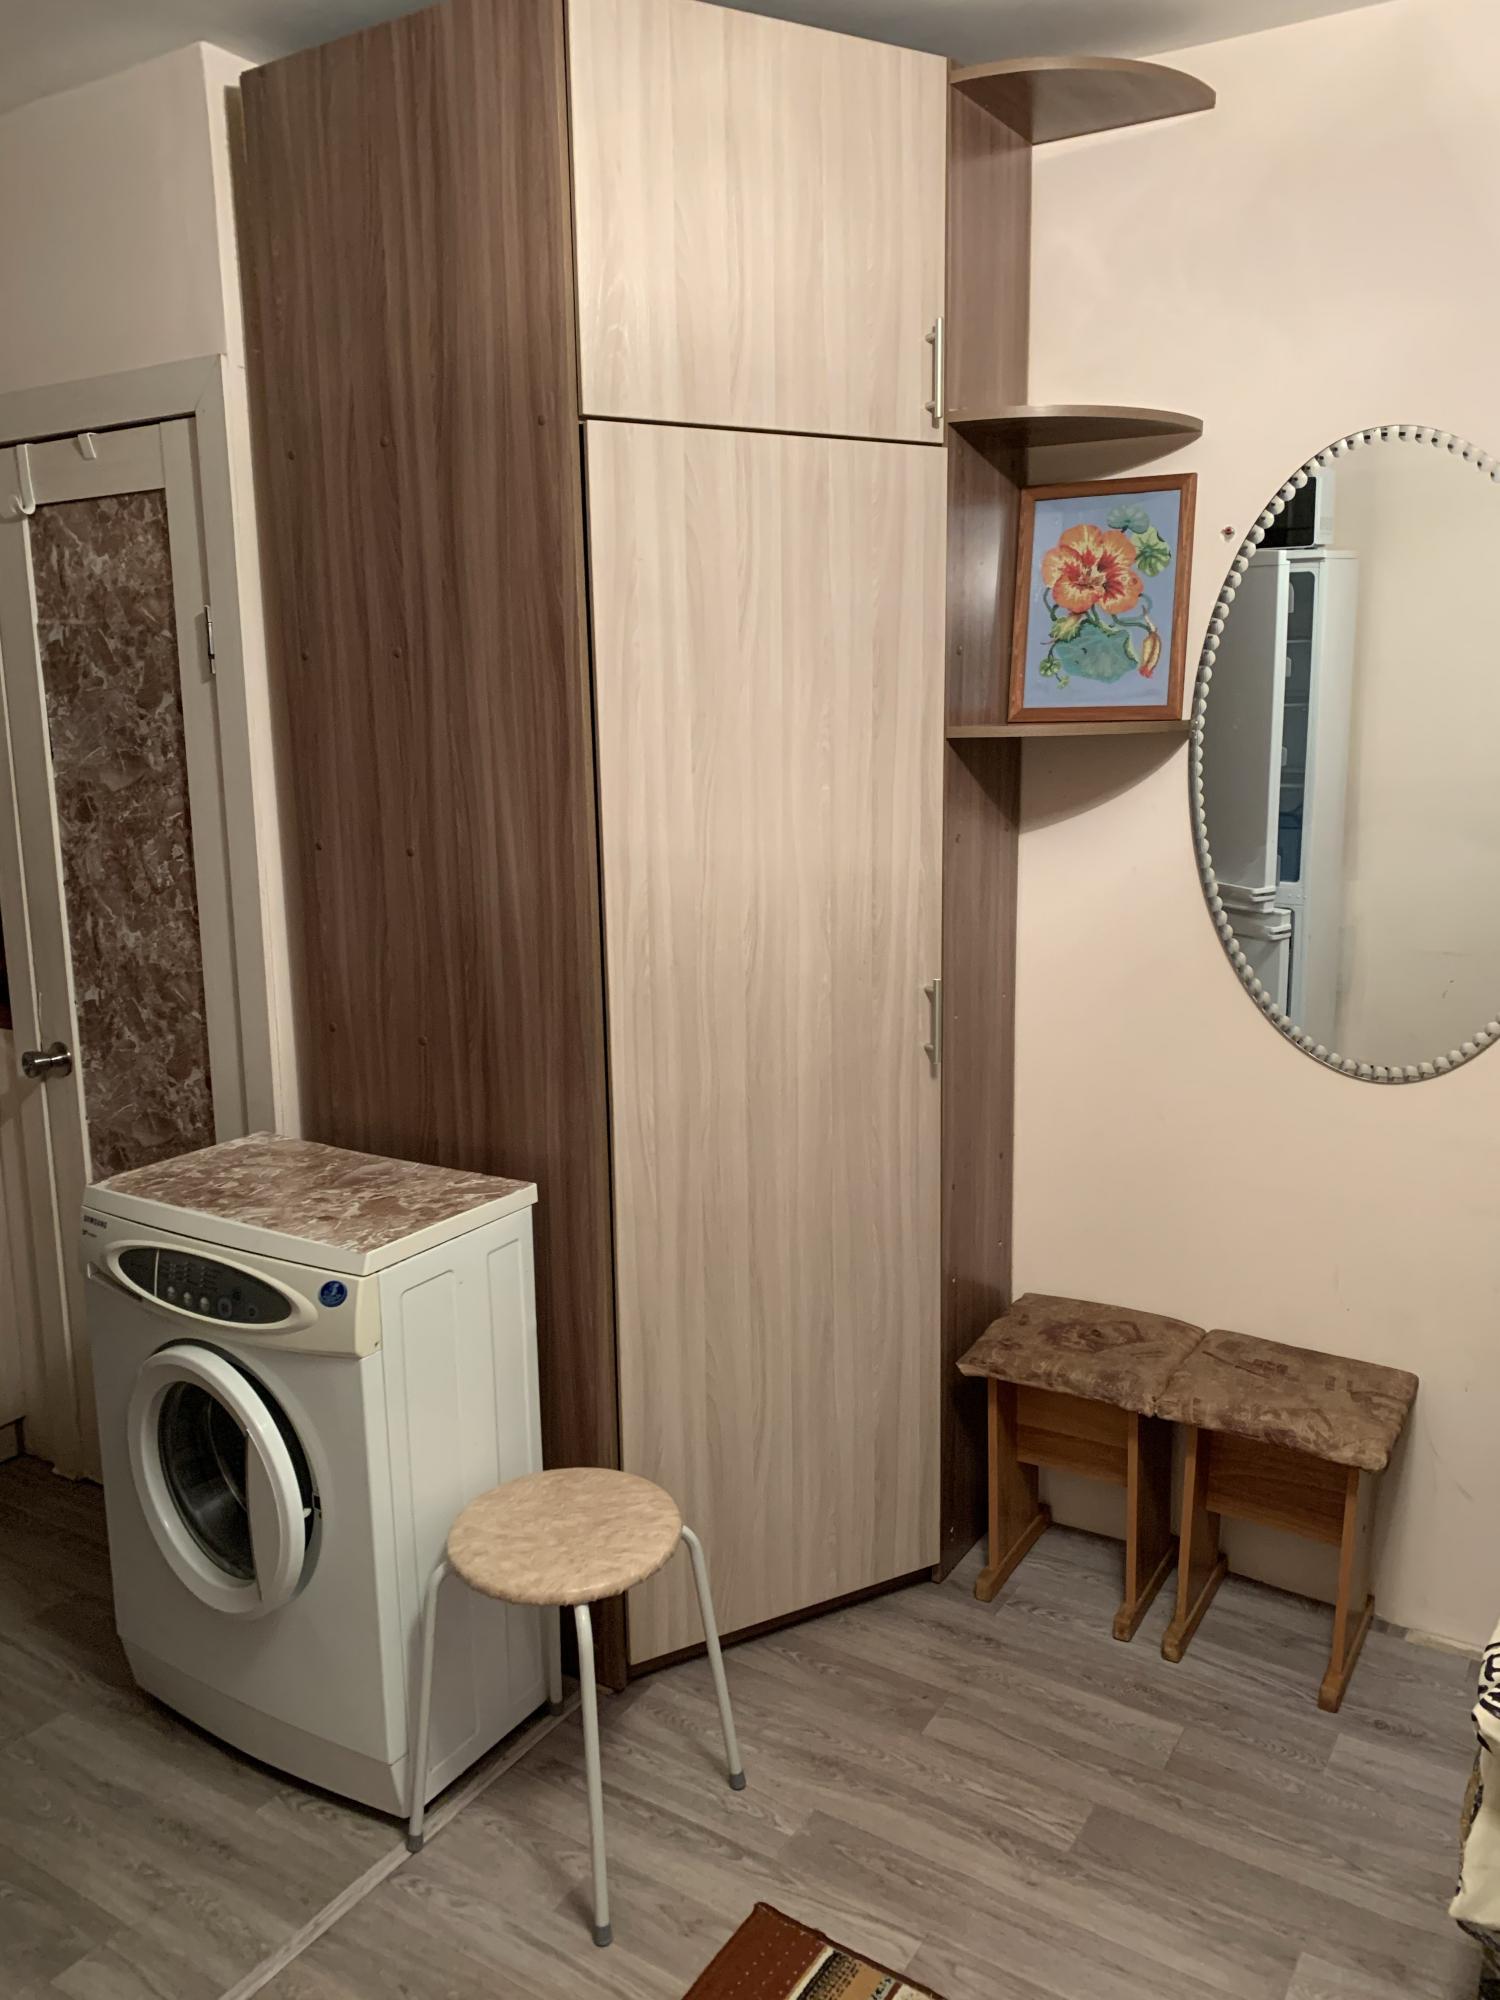 1к квартира Семафорная улица | 12000 | аренда в Красноярске фото 3